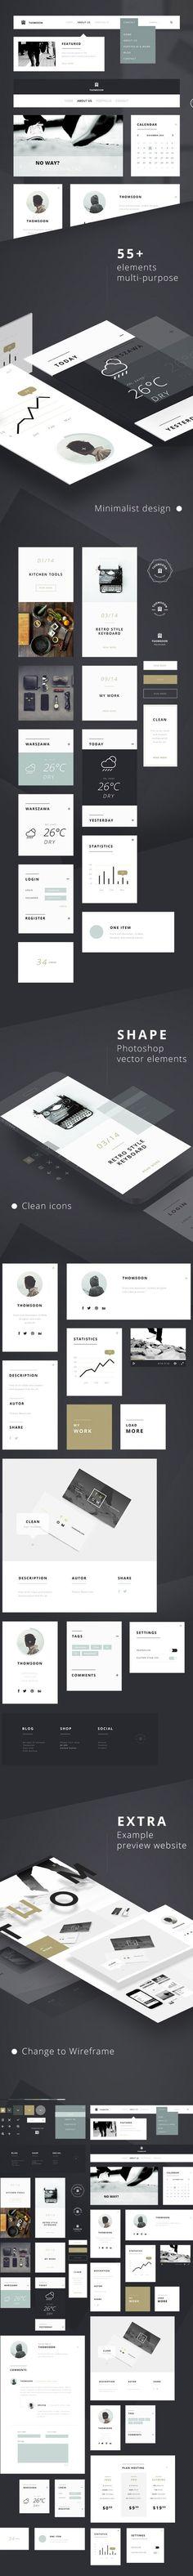 55-free-ui-kit-elements – UI-Kits